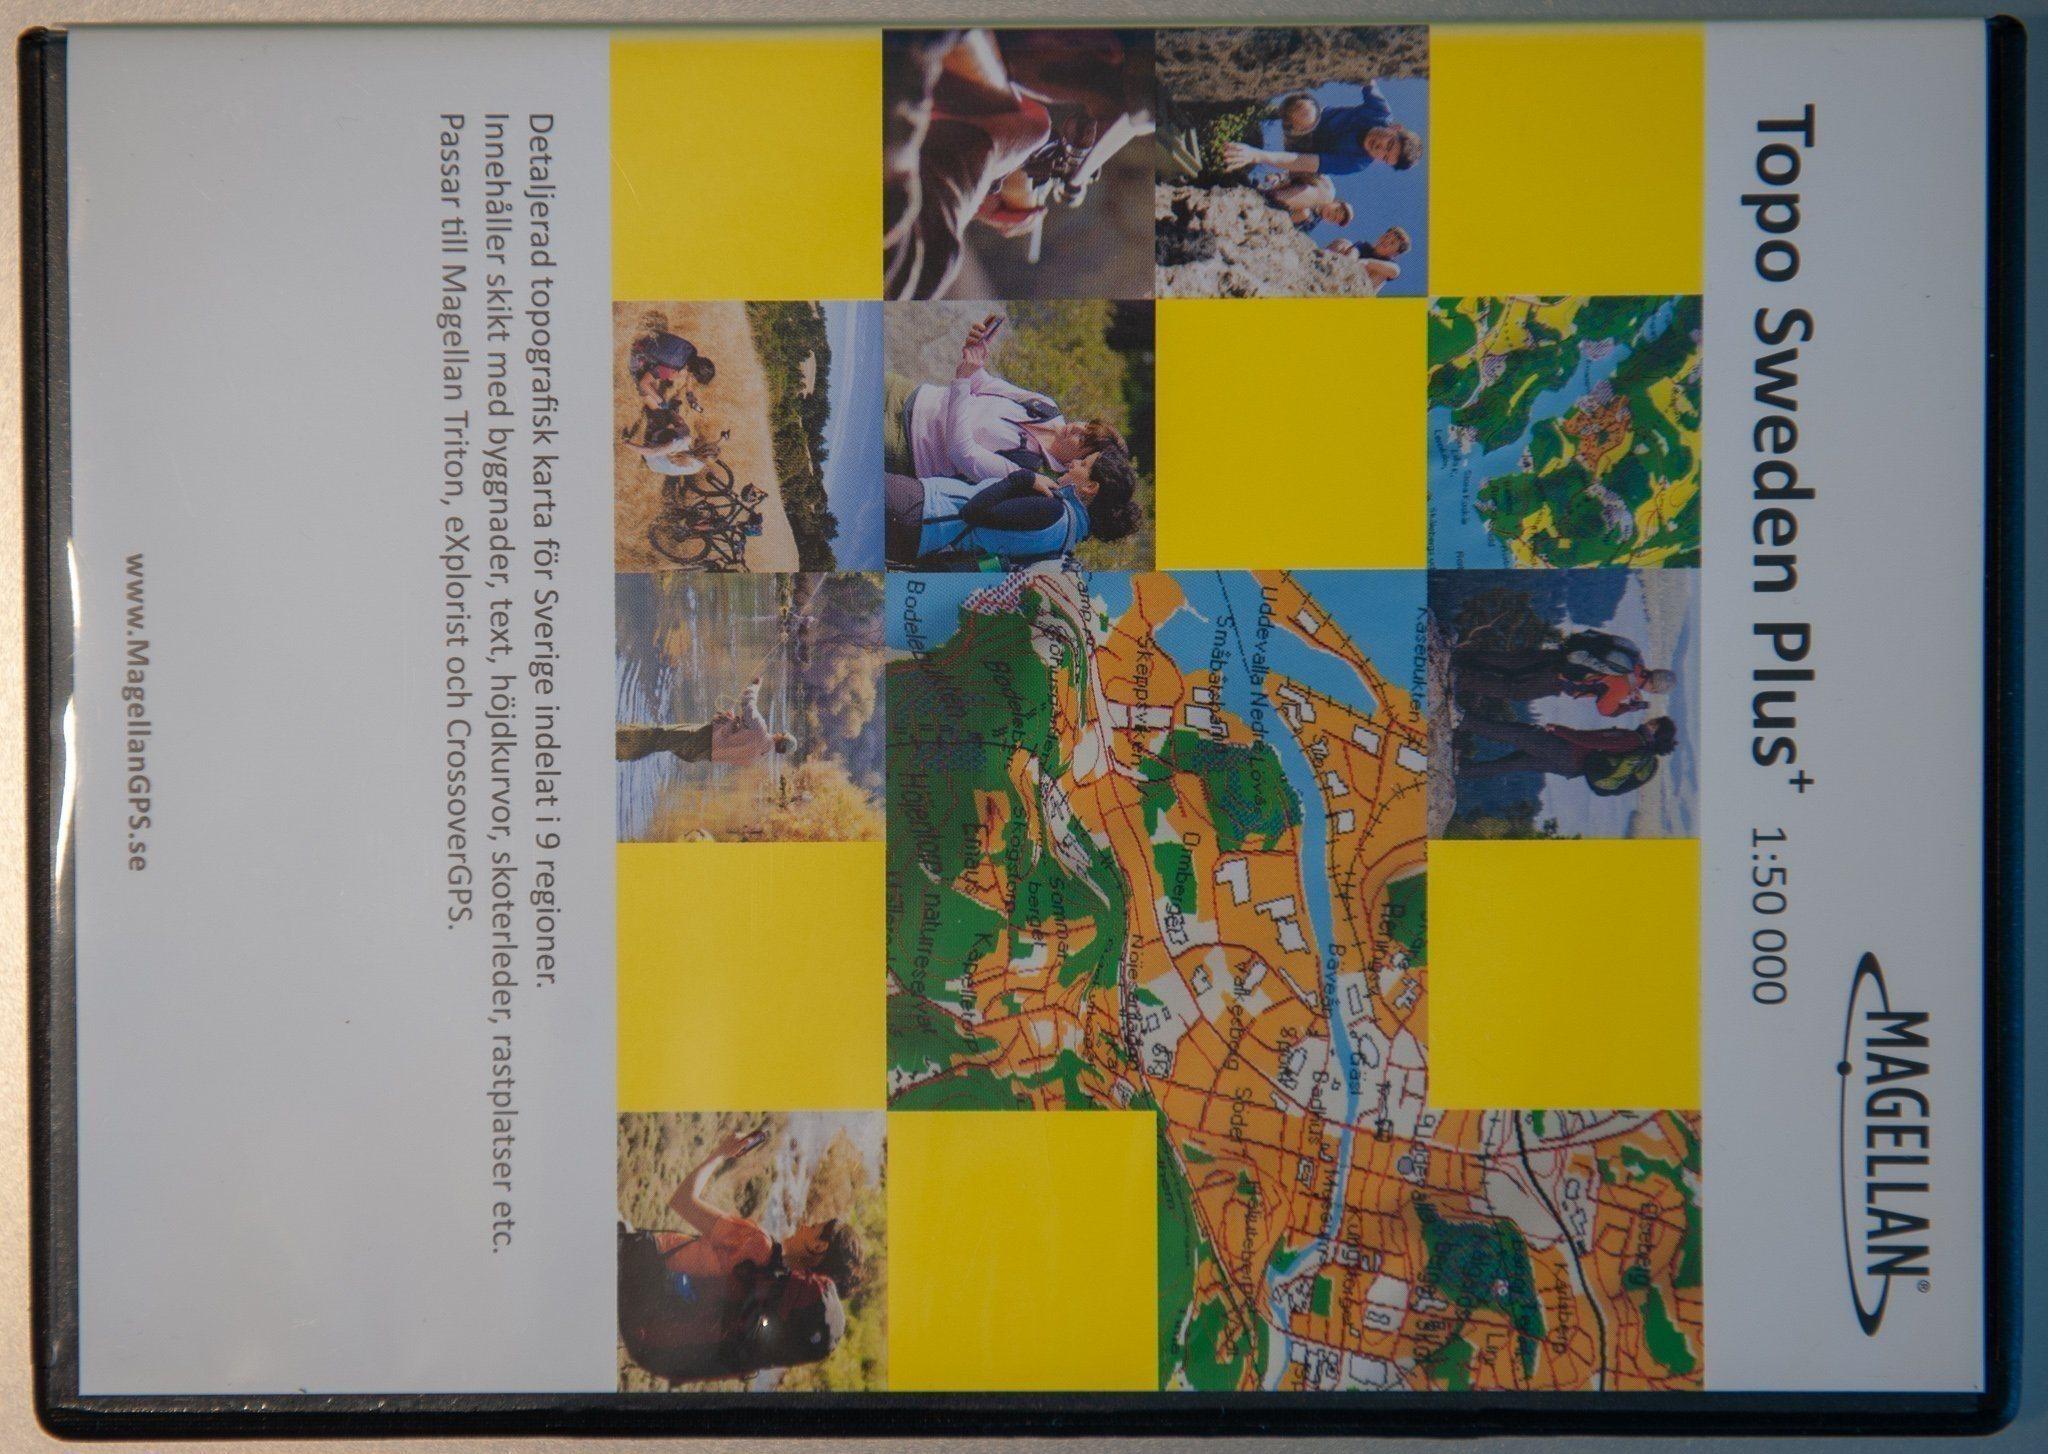 Karta Blekinge Skane.Magellan Topo Sweden Plus Region 9 Halland 343018532 ᐈ Kop